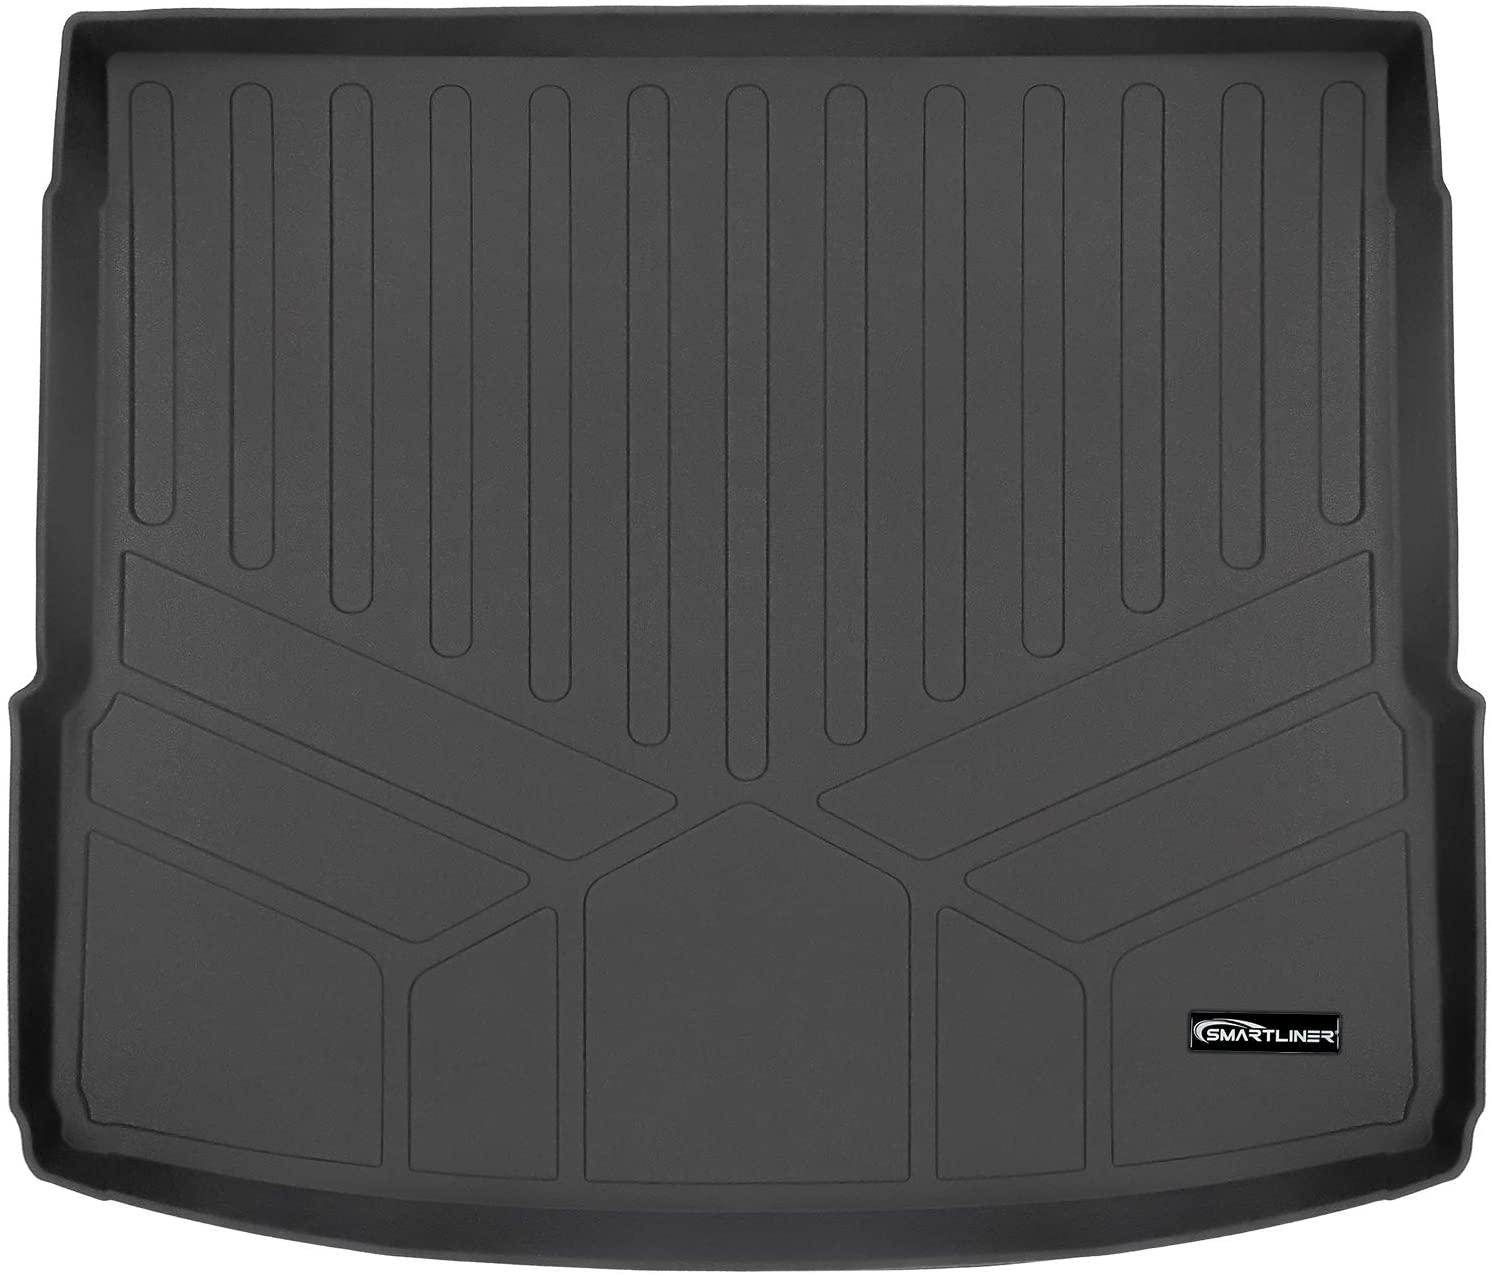 SMARTLINER All Weather Custom Fit Cargo Trunk Liner Floor Mat Black for 2018-2020 Audi Q5 / SQ5